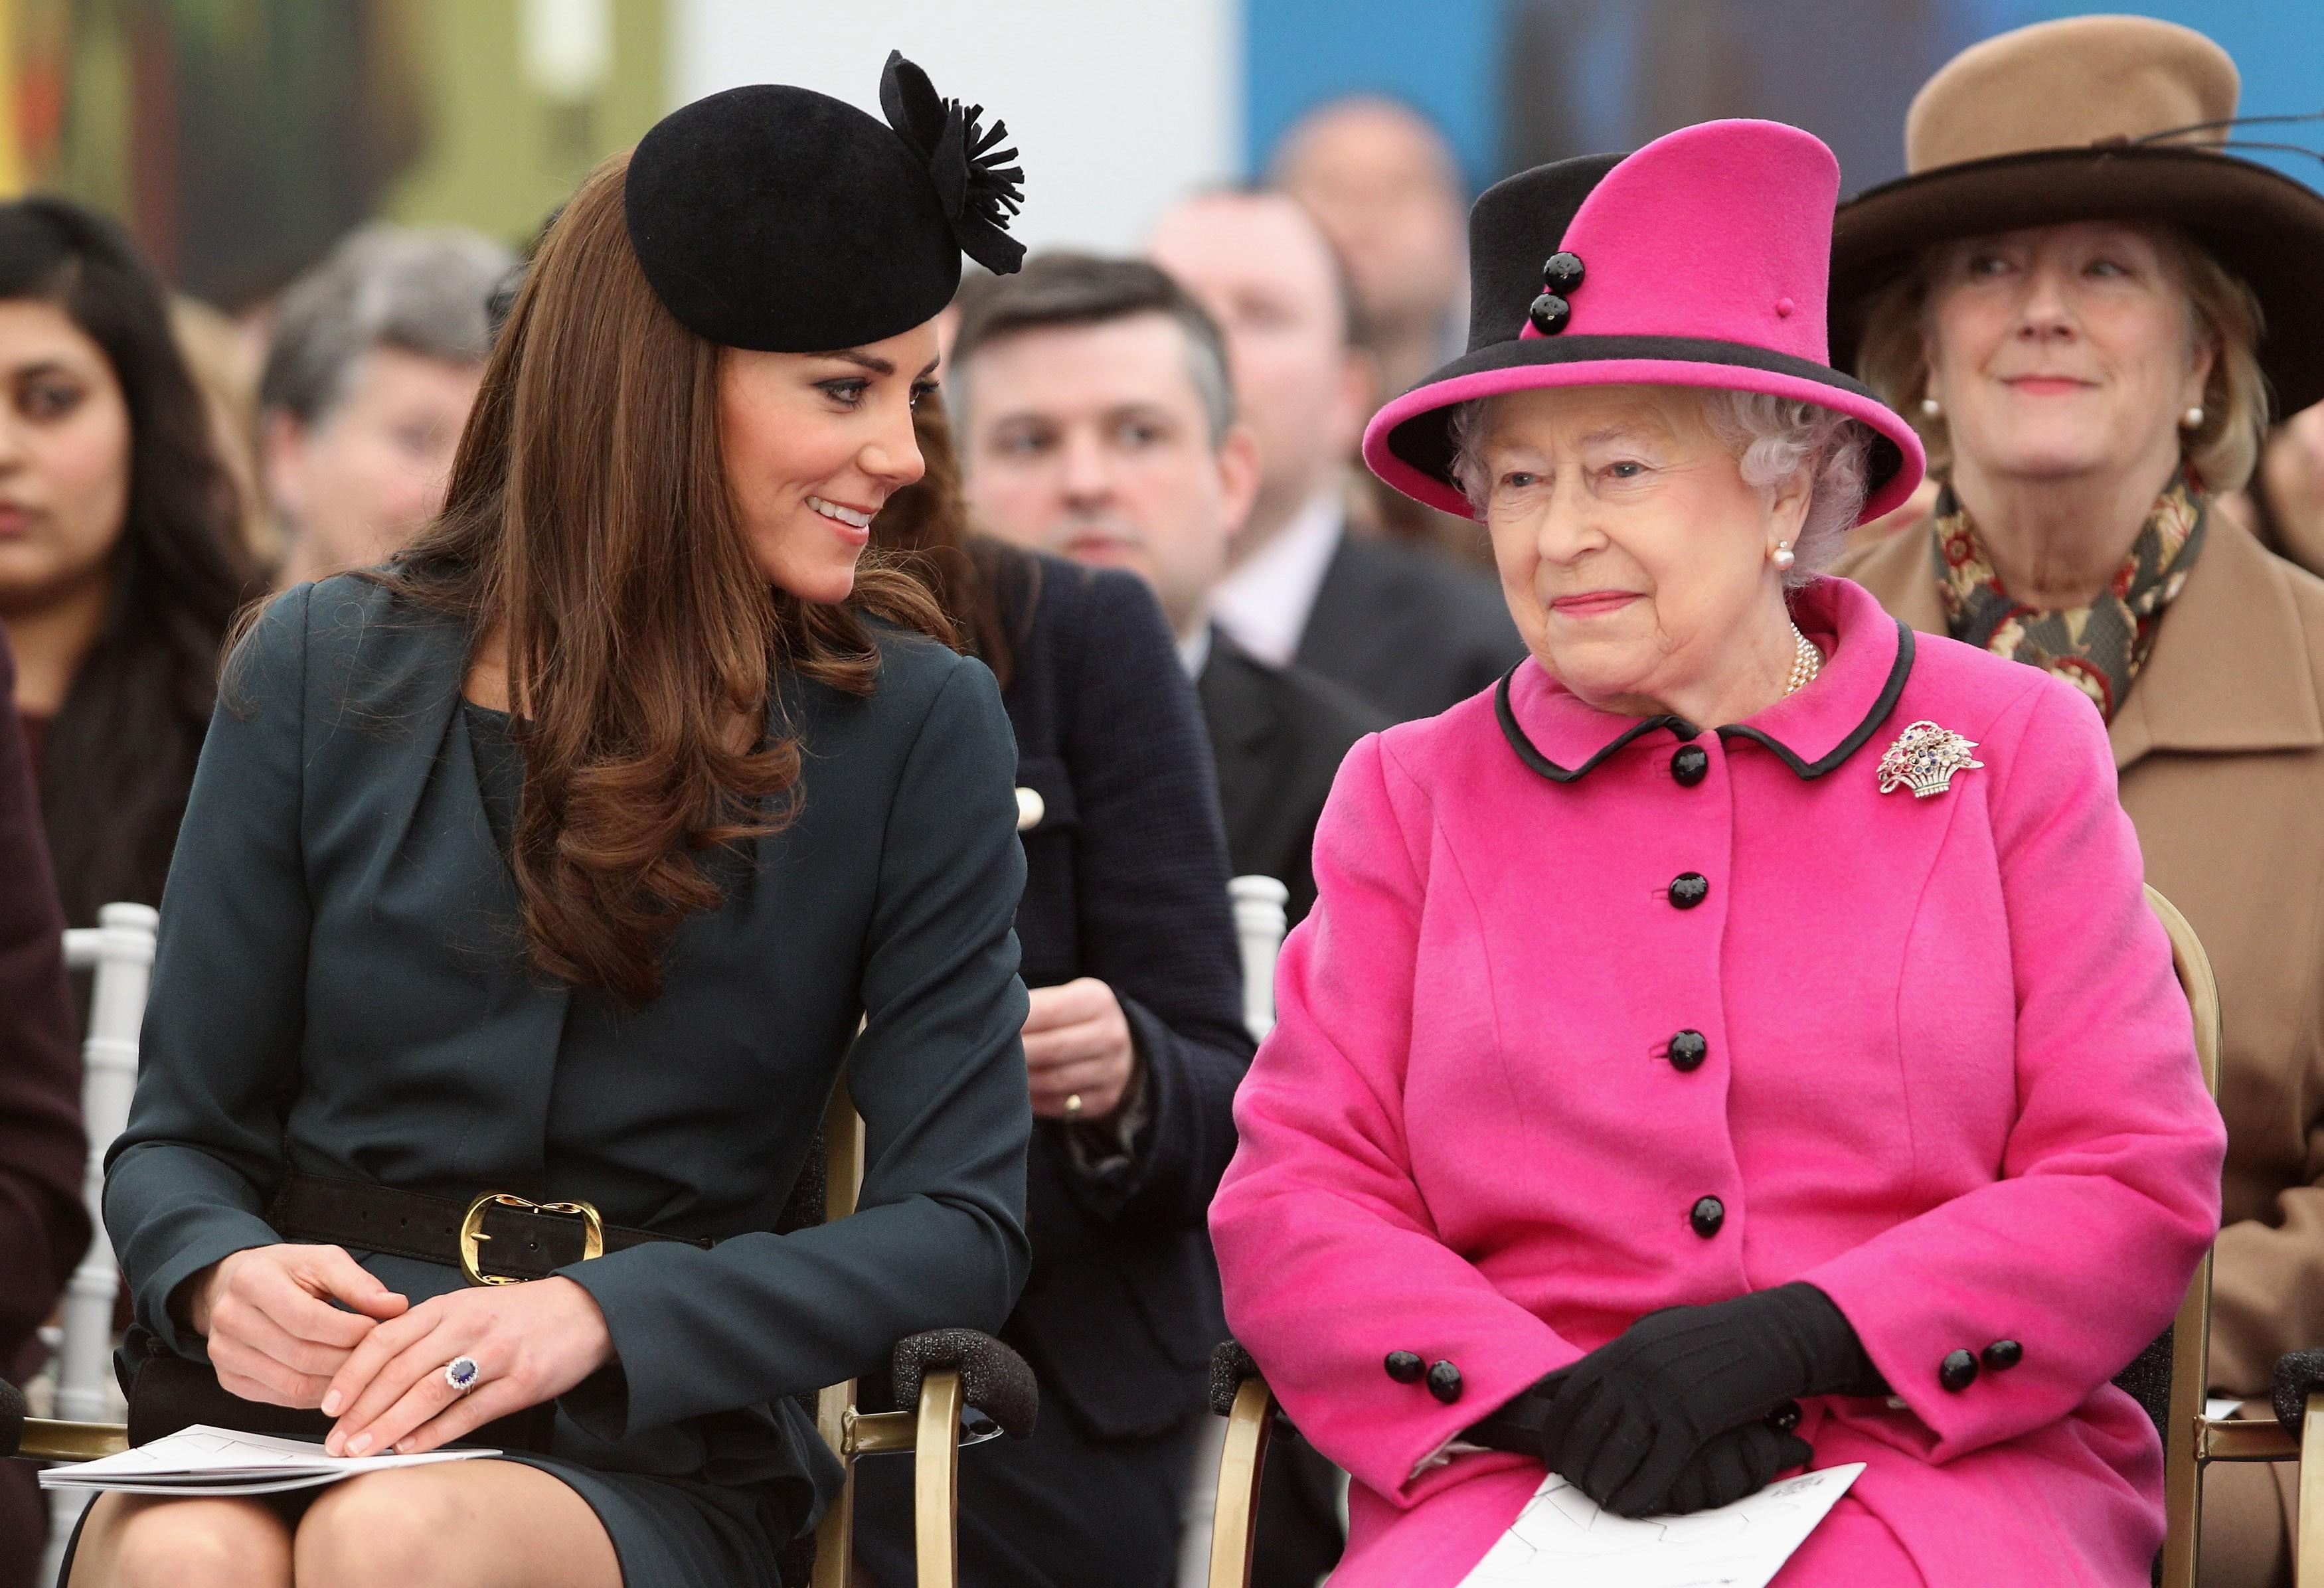 Kate Middleton com a Rainha Elizabeth 2ª (Foto: Getty Images)